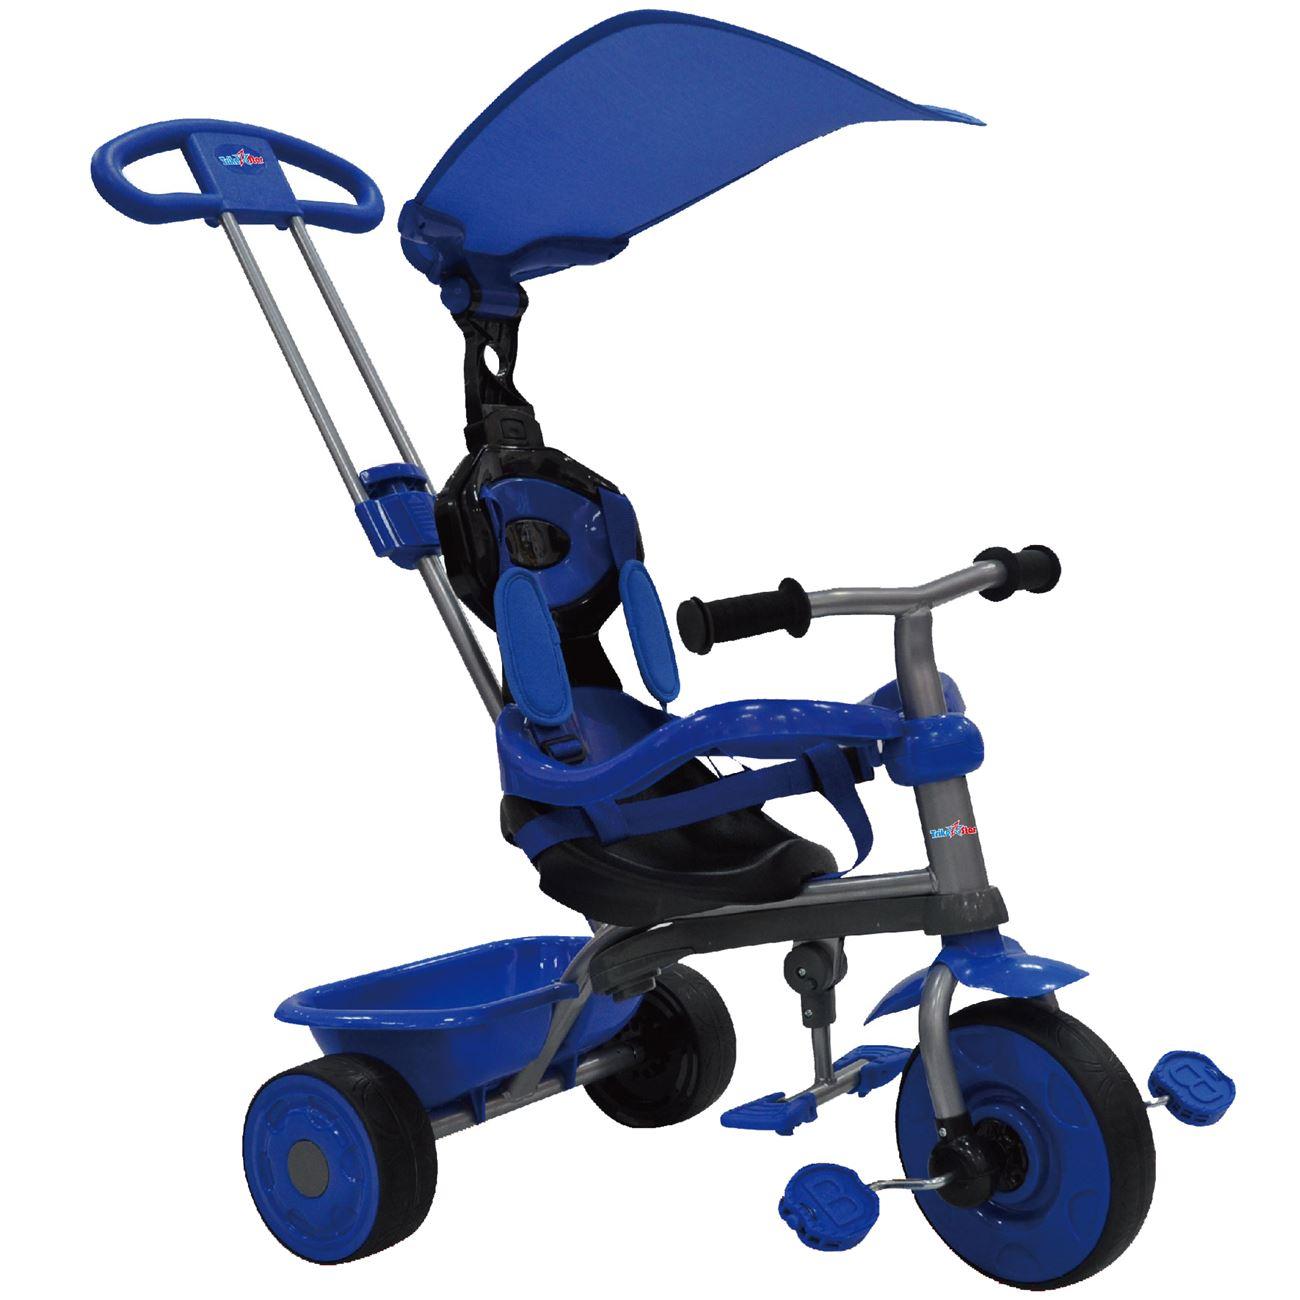 868c1d98b1 Ποδήλατο Τρίκυκλο Μεταλλικό 3σε1 Μπλε   Τρίκυκλα Ποδήλατα Βρεφικά ...